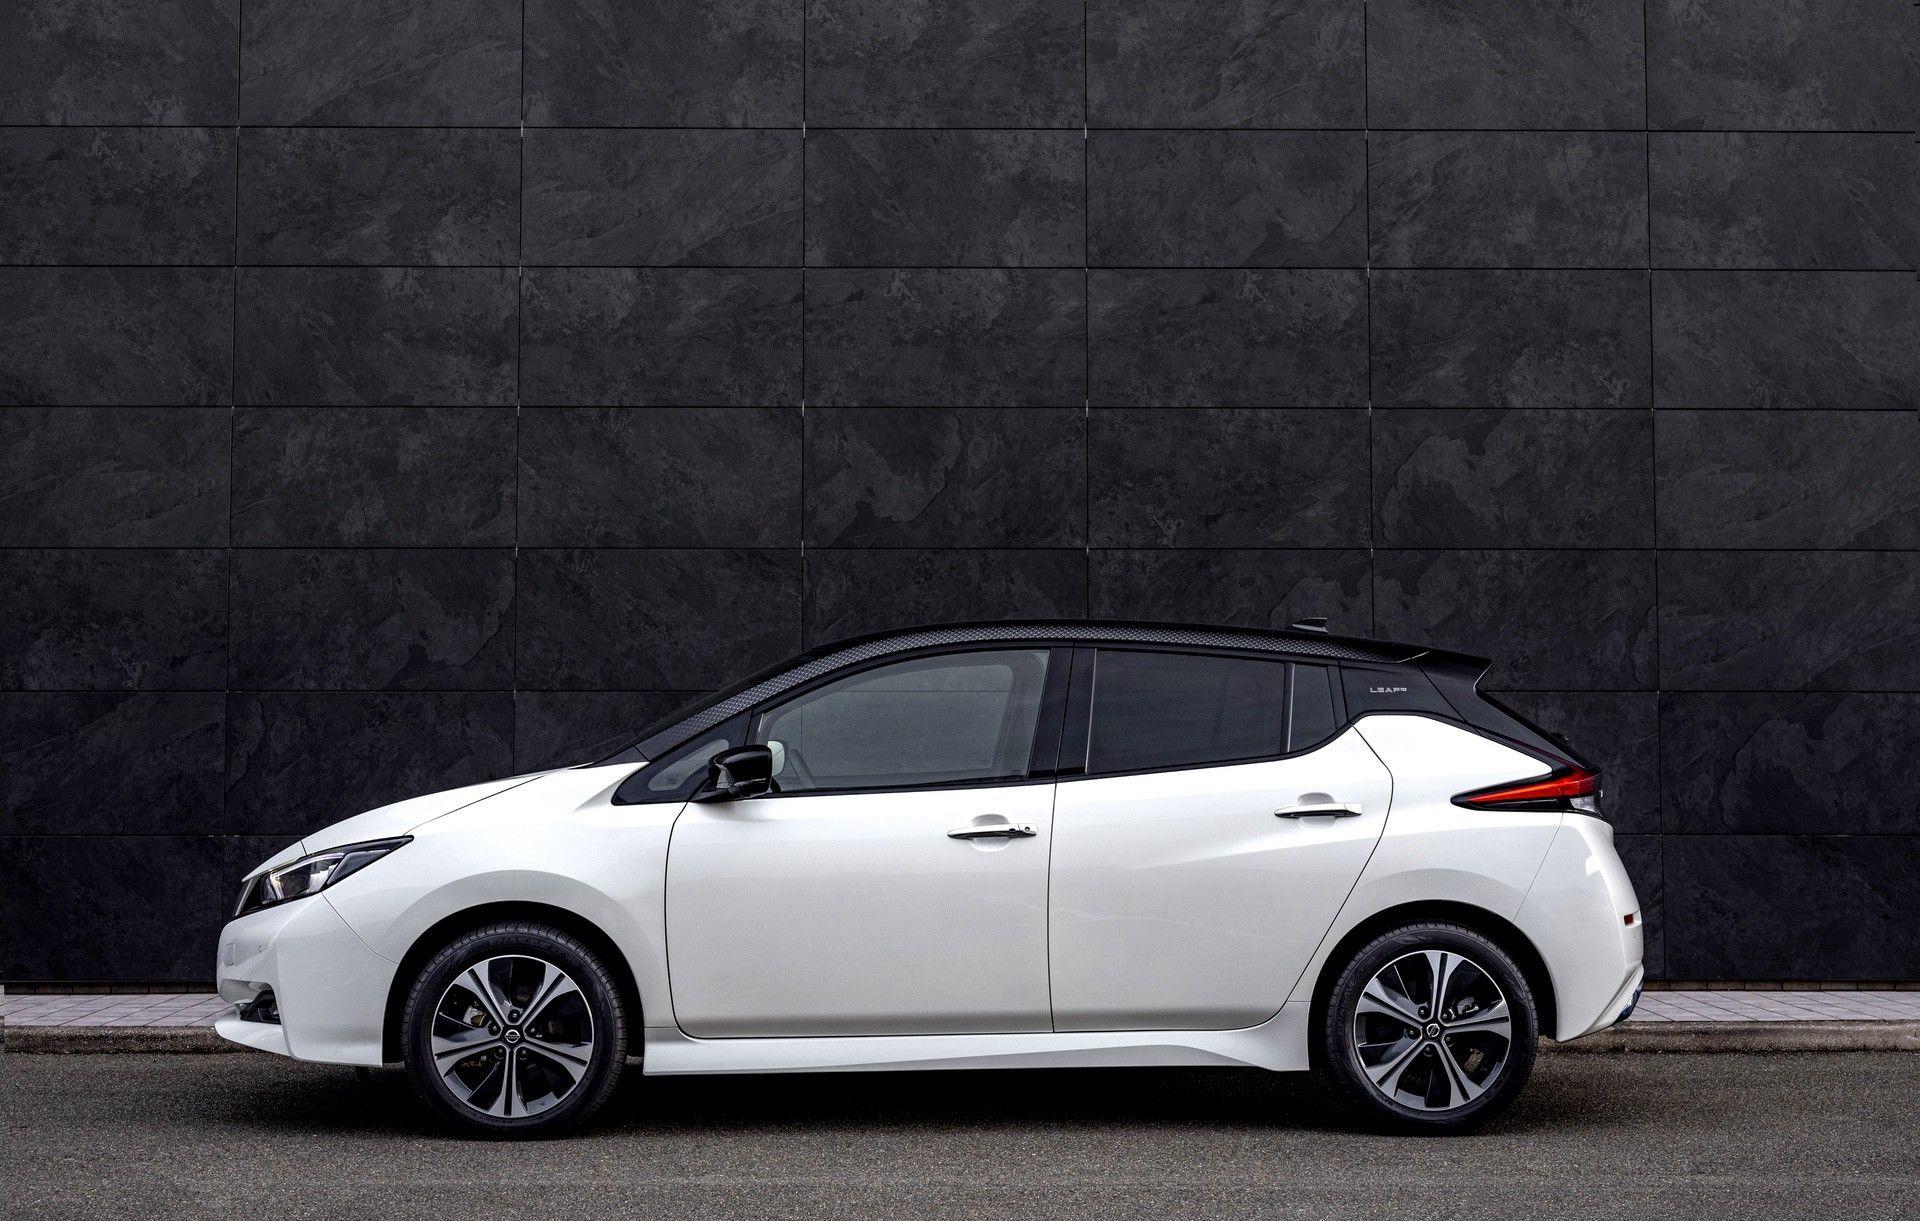 Nissan_Leaf10_special_edition-0006